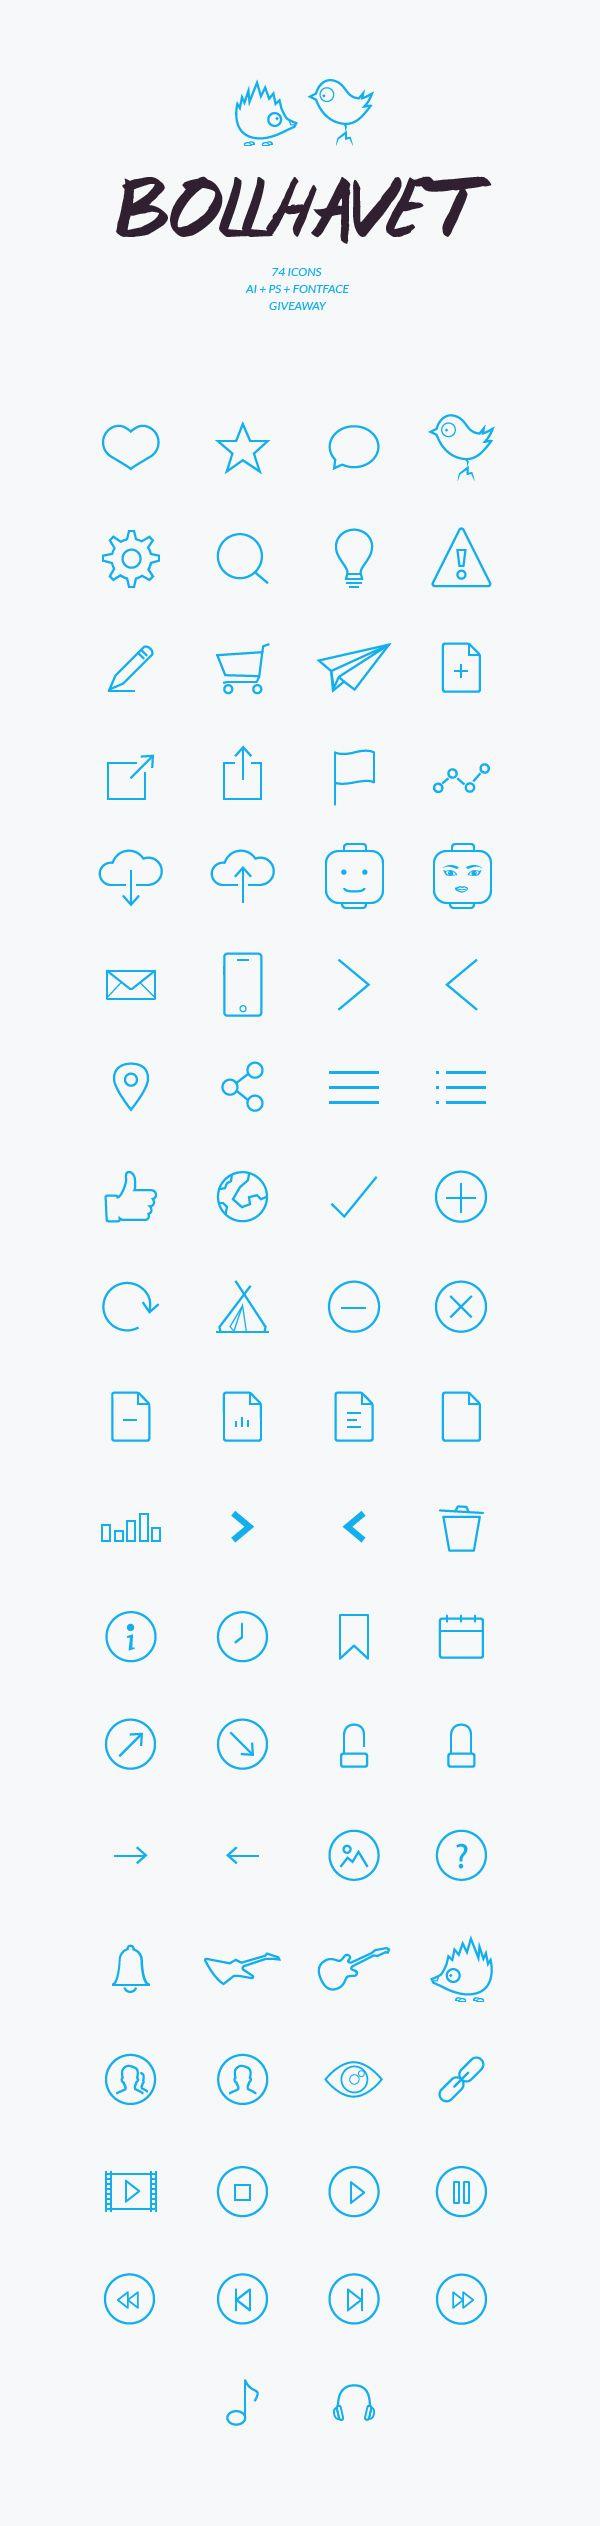 Bollhavet Free Flat Icon Set